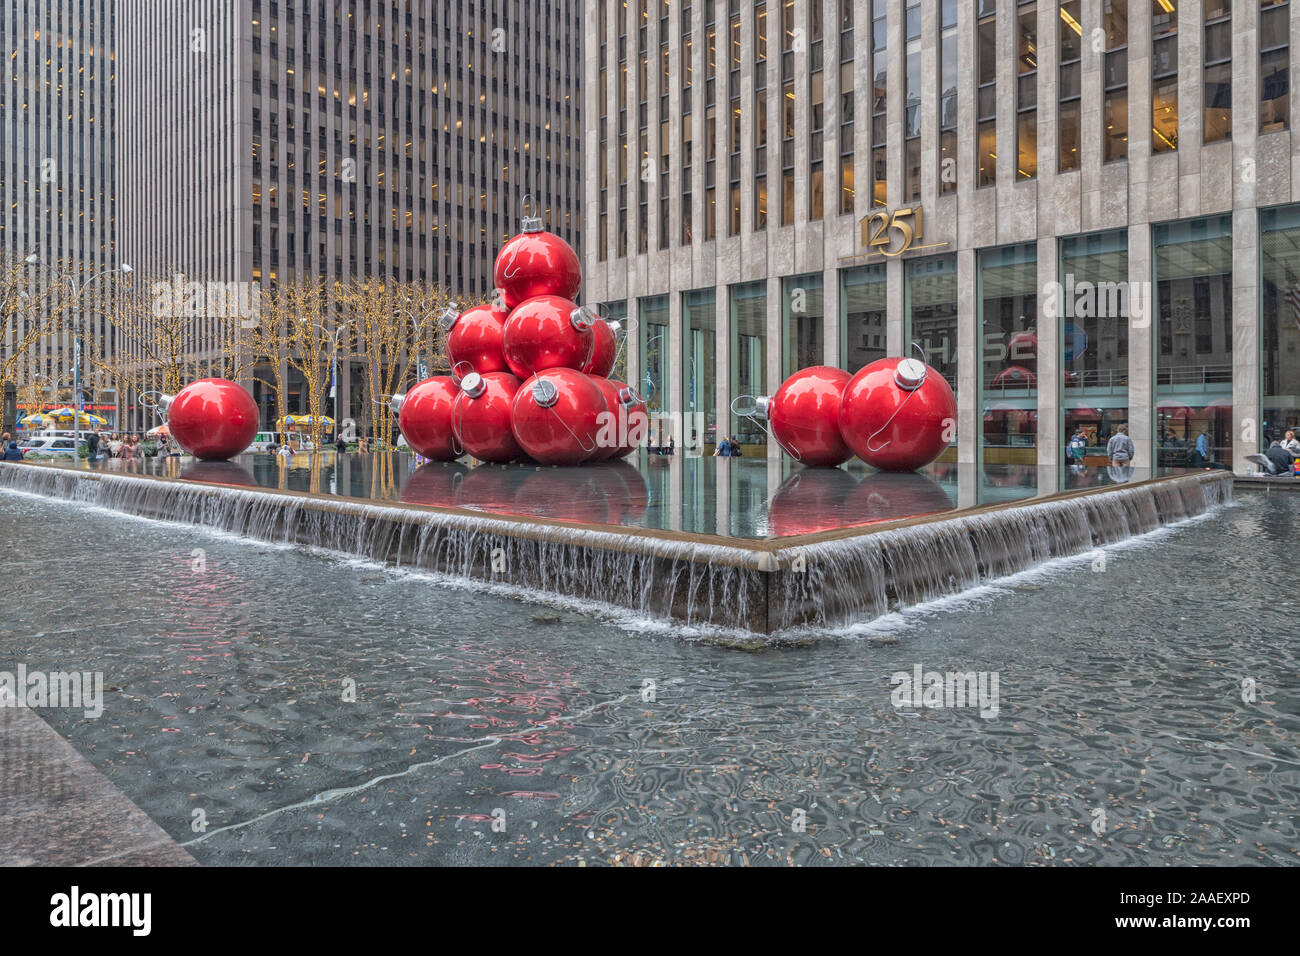 Giant Christmas ornament balls outside Rockefeller center on Sixth Ave, New York city,USA. Stock Photo